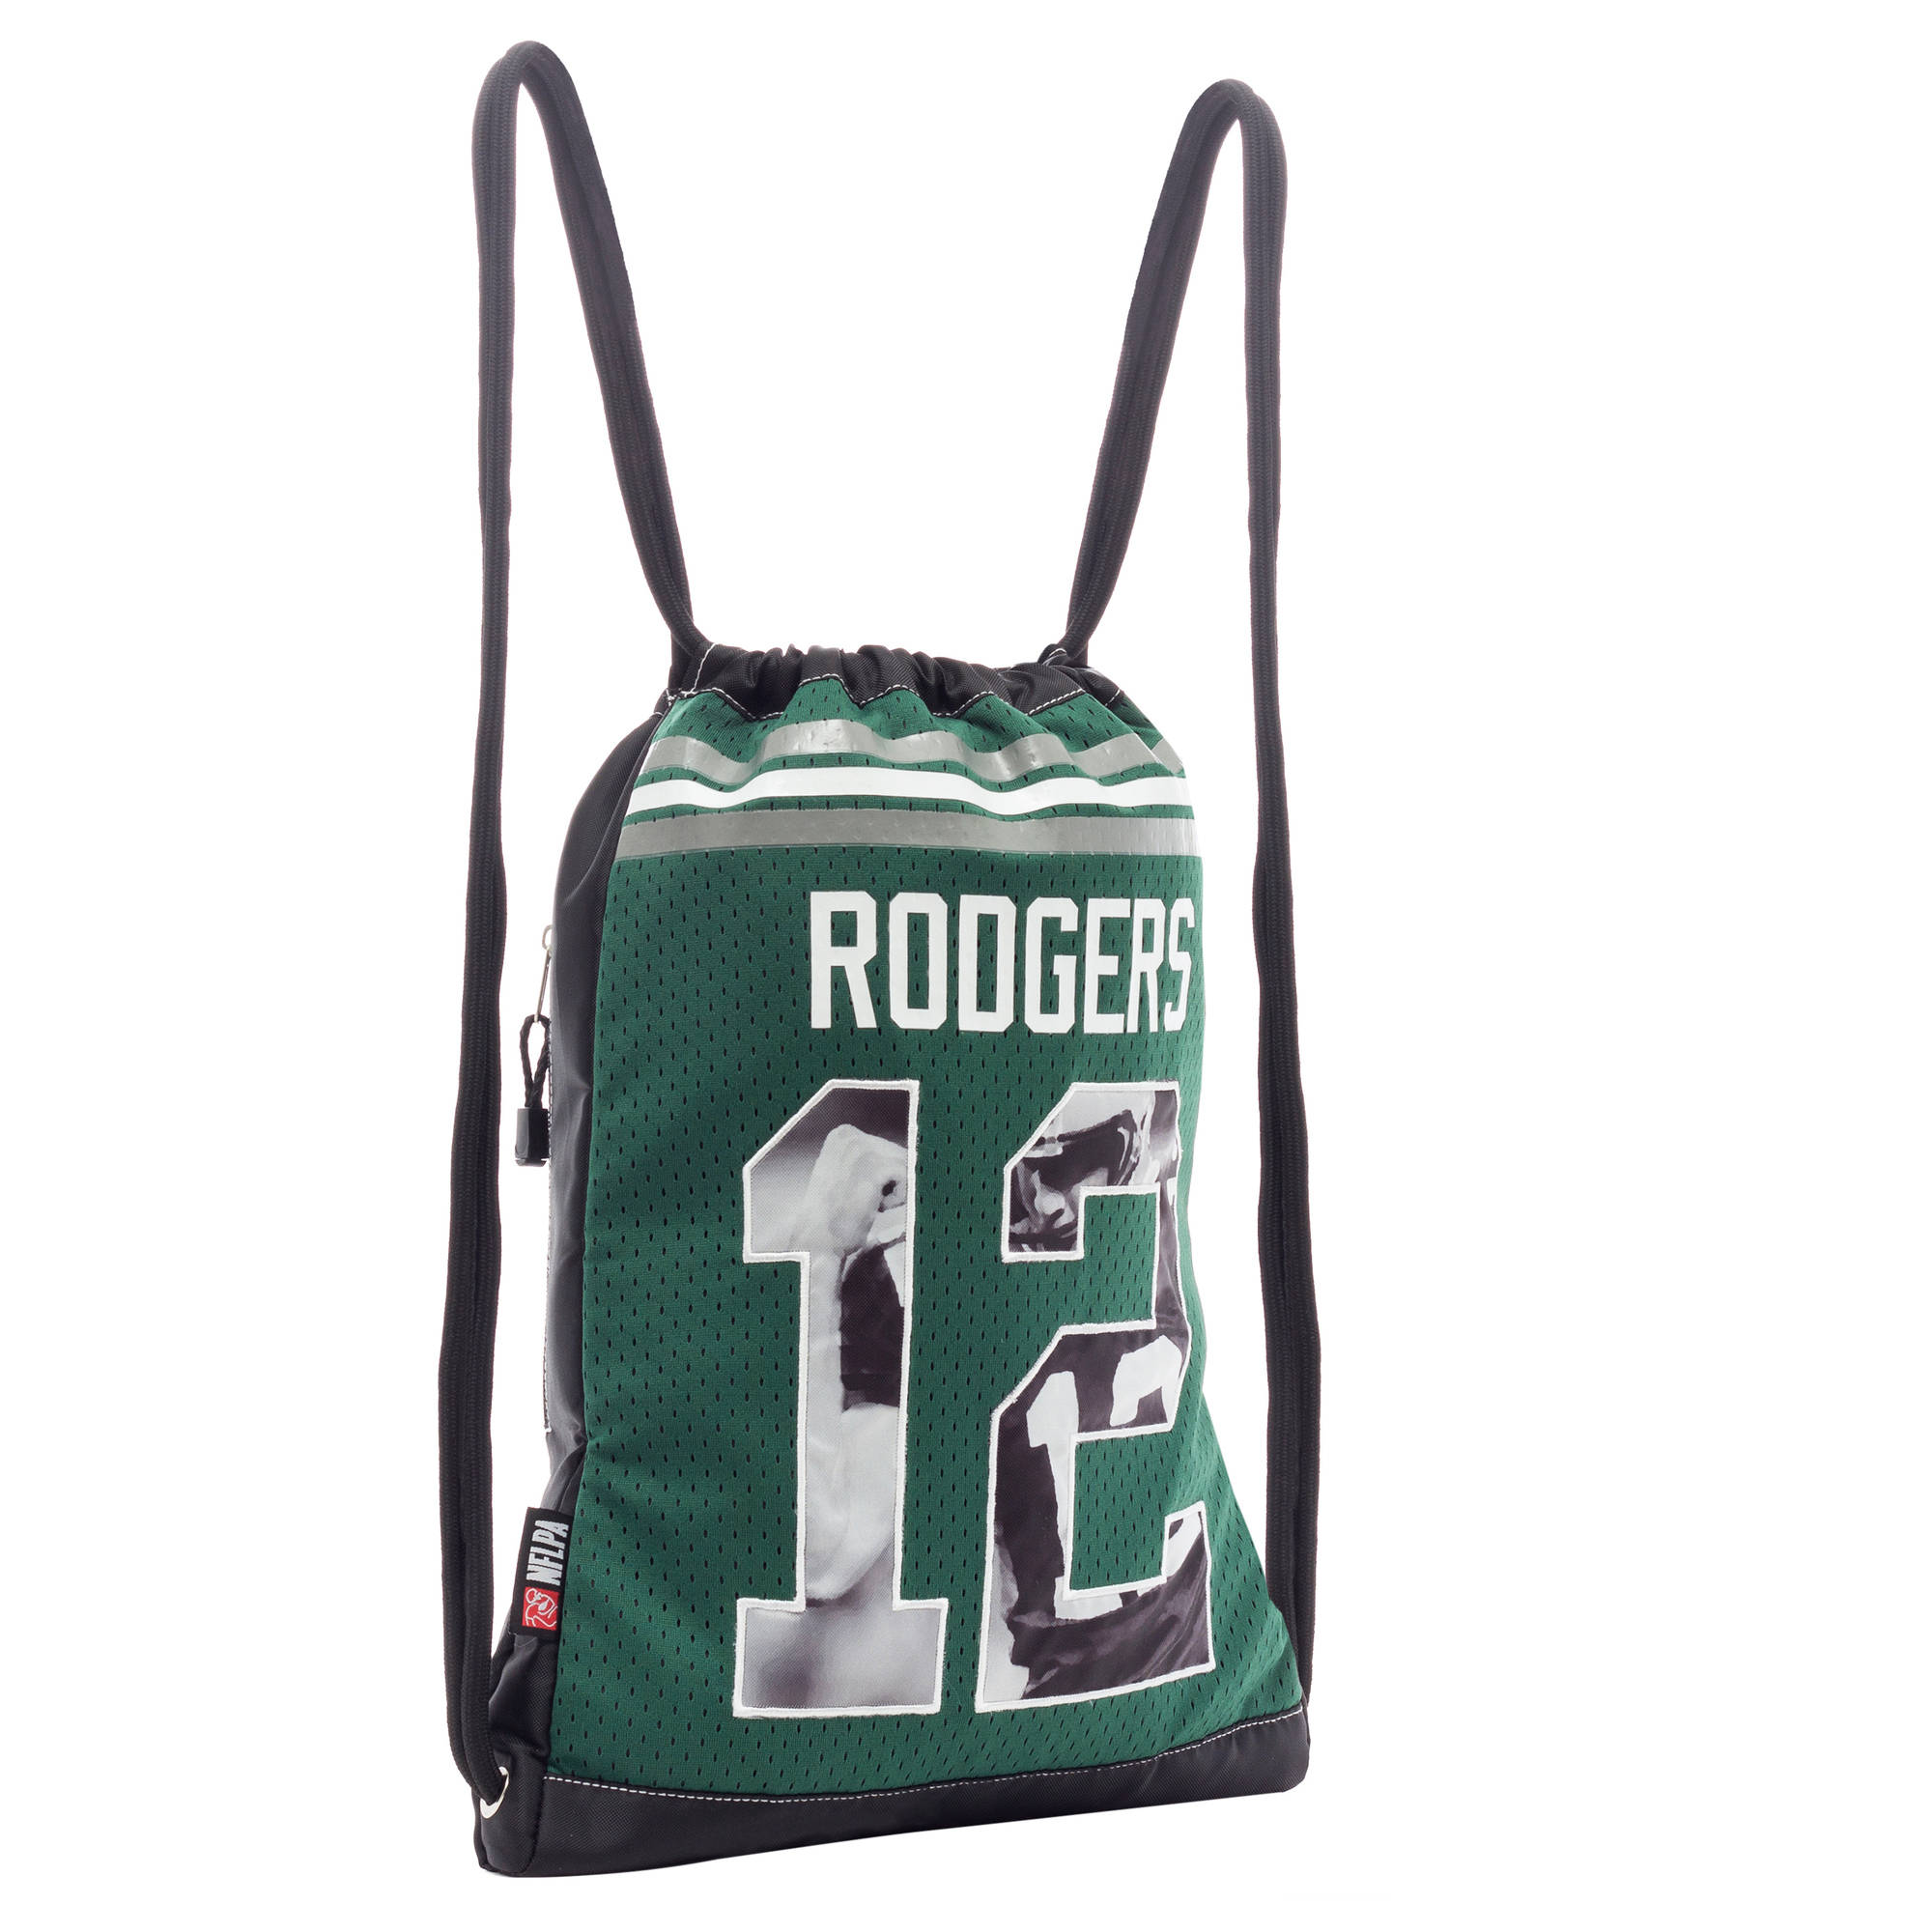 NFLPA Aaron Rodgers #12 Sling Bag - Walmart.com